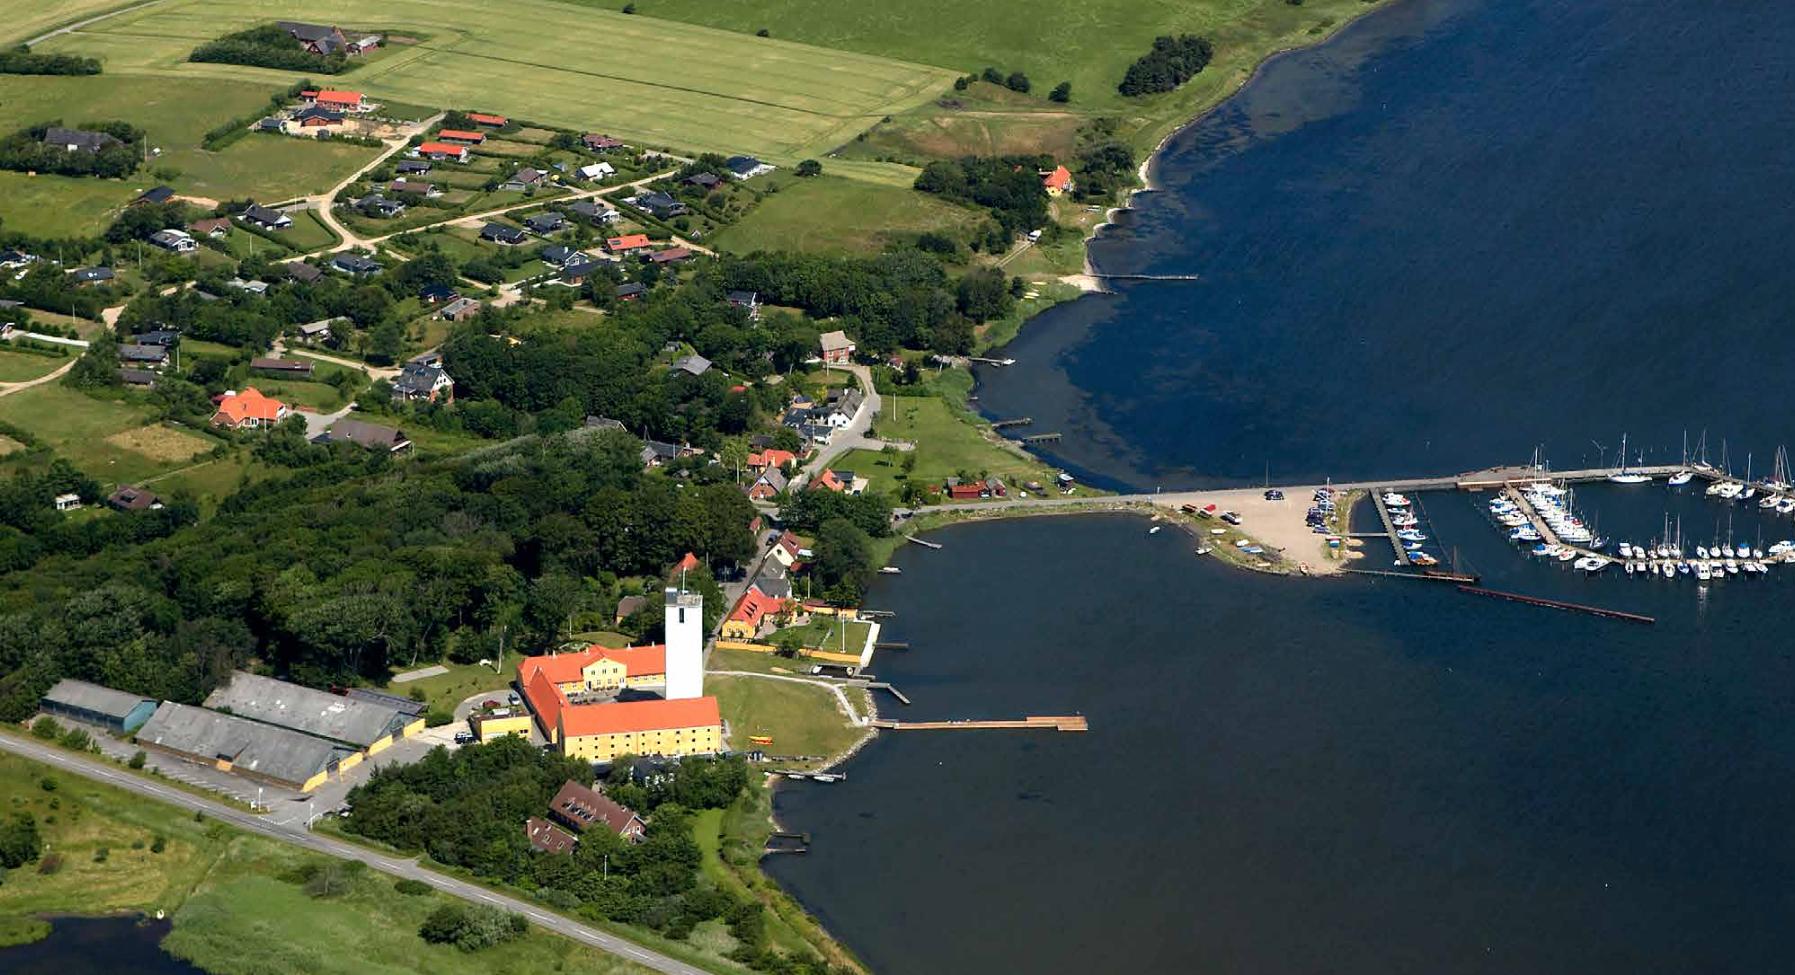 Fjordbyernes Turistprojekt